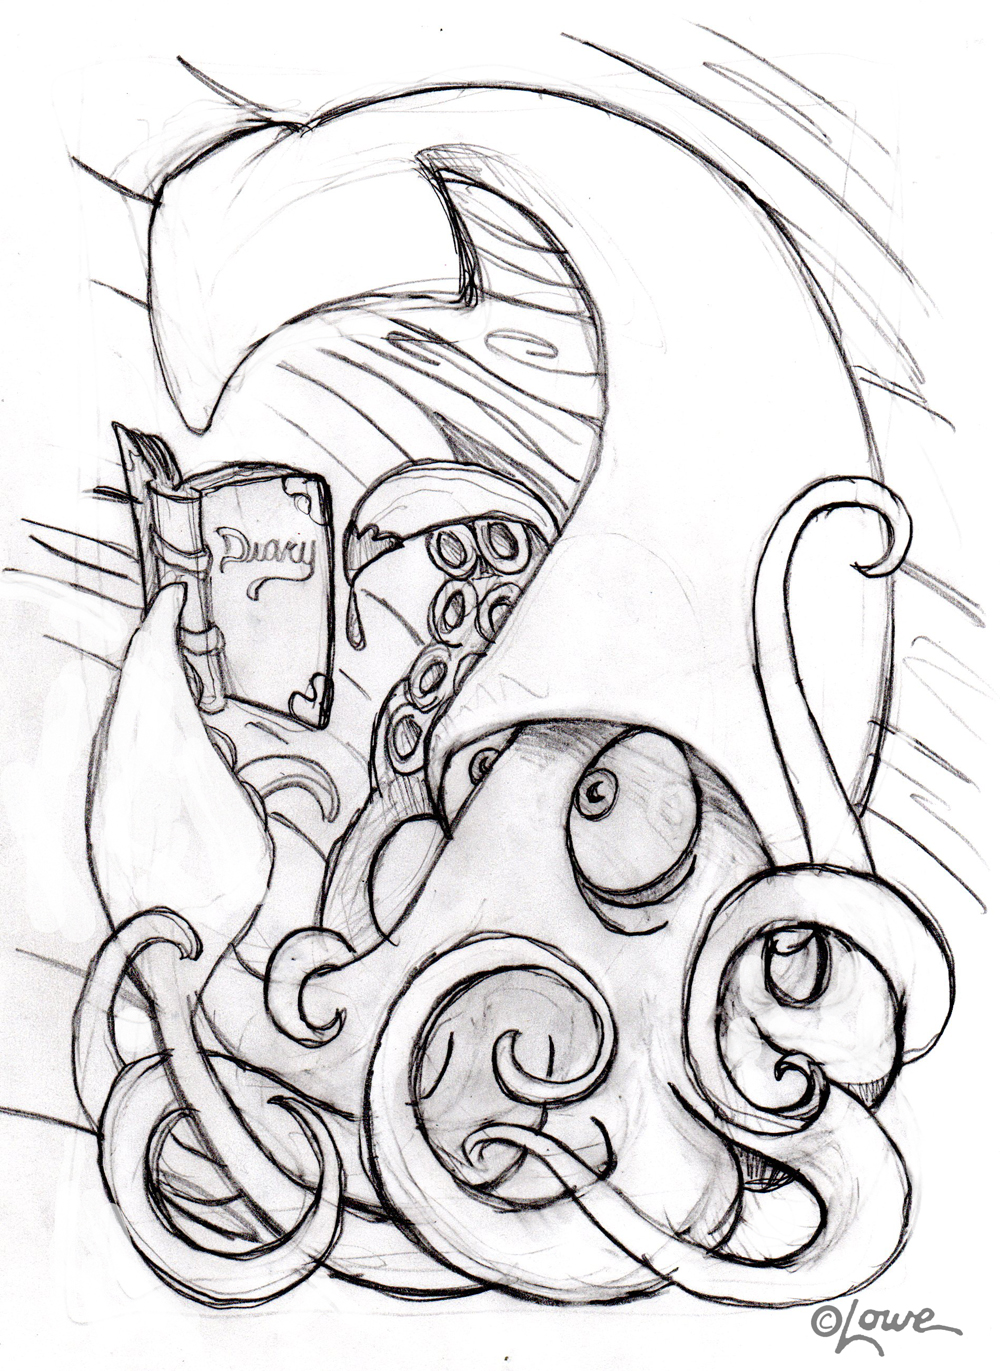 1000x1371 Dave Lowe Design The Blog Eddie Izzard's Giant Squid